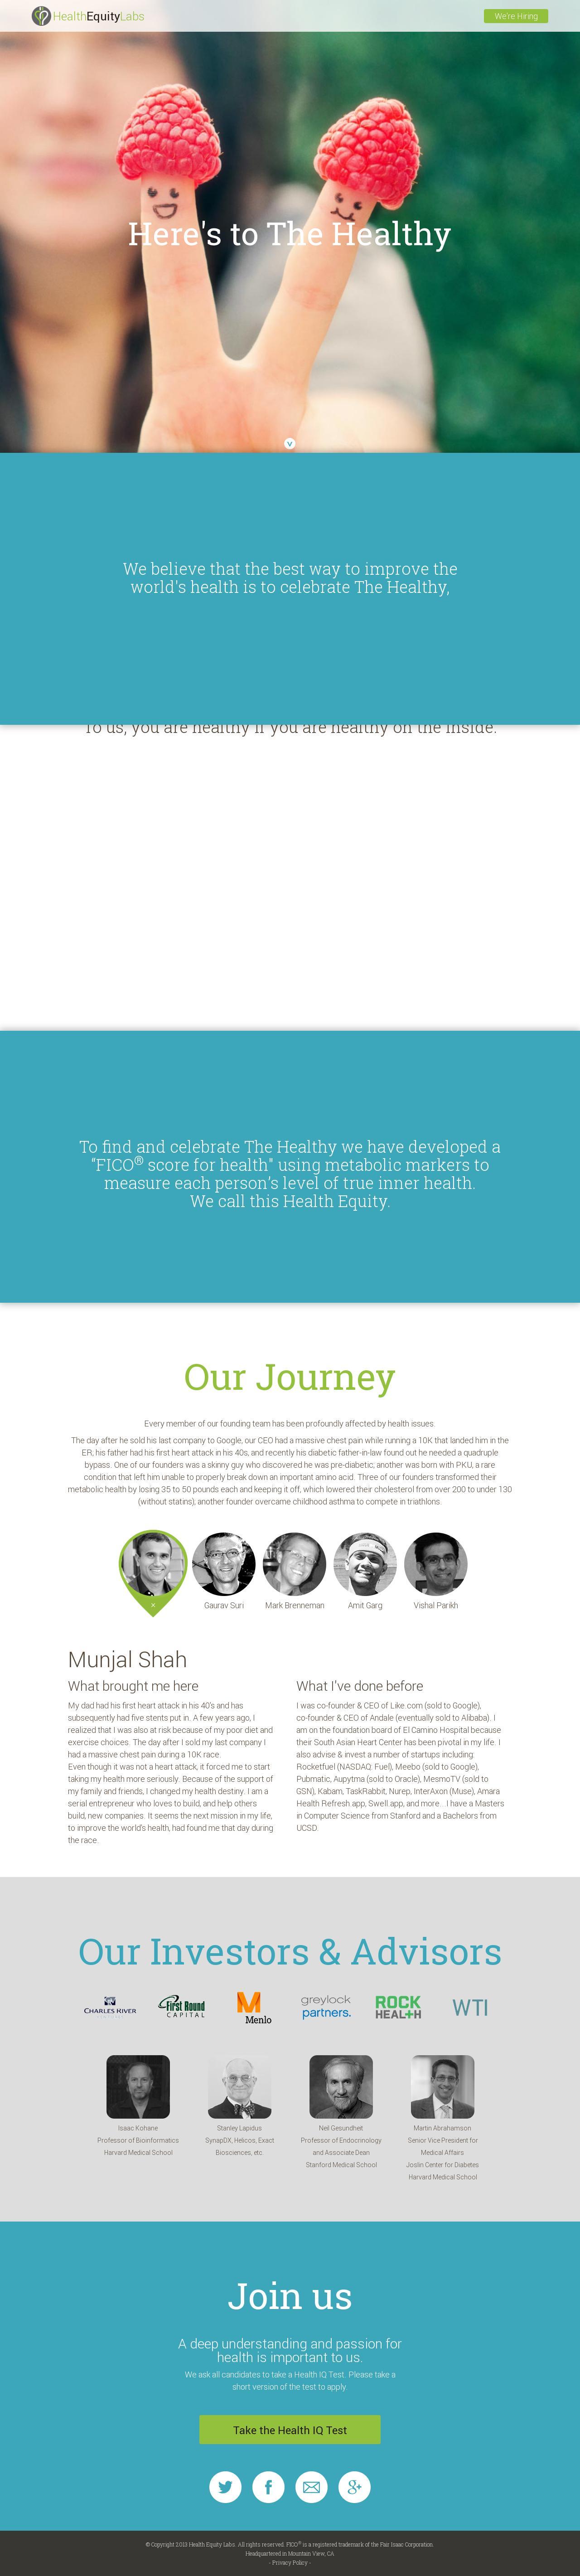 Screenshot of healthequitylabs.com - HealthEquity Labs - captured July 11, 2014